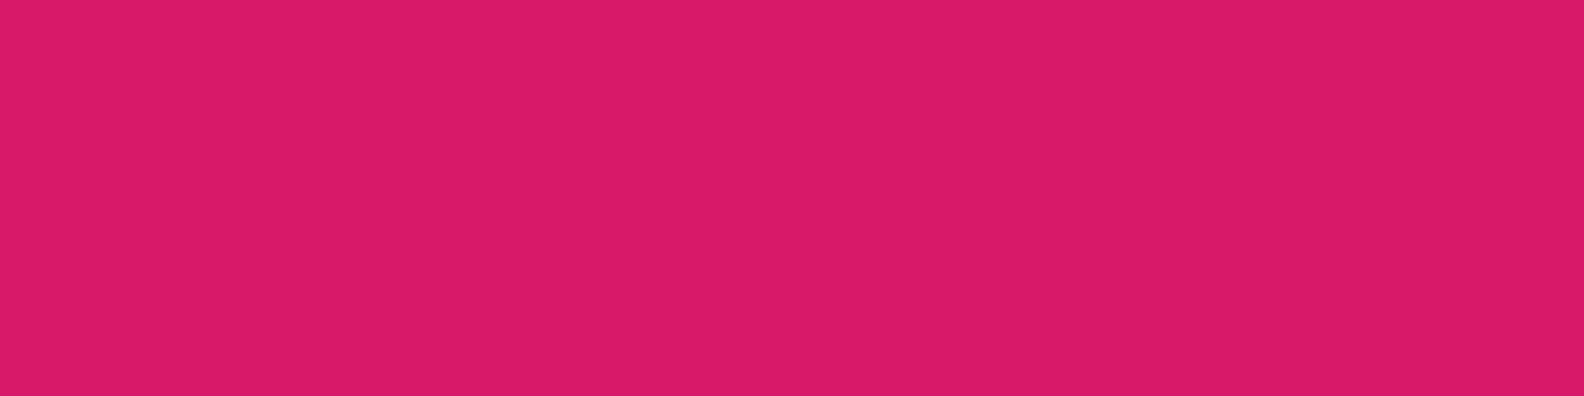 1584x396 Dogwood Rose Solid Color Background